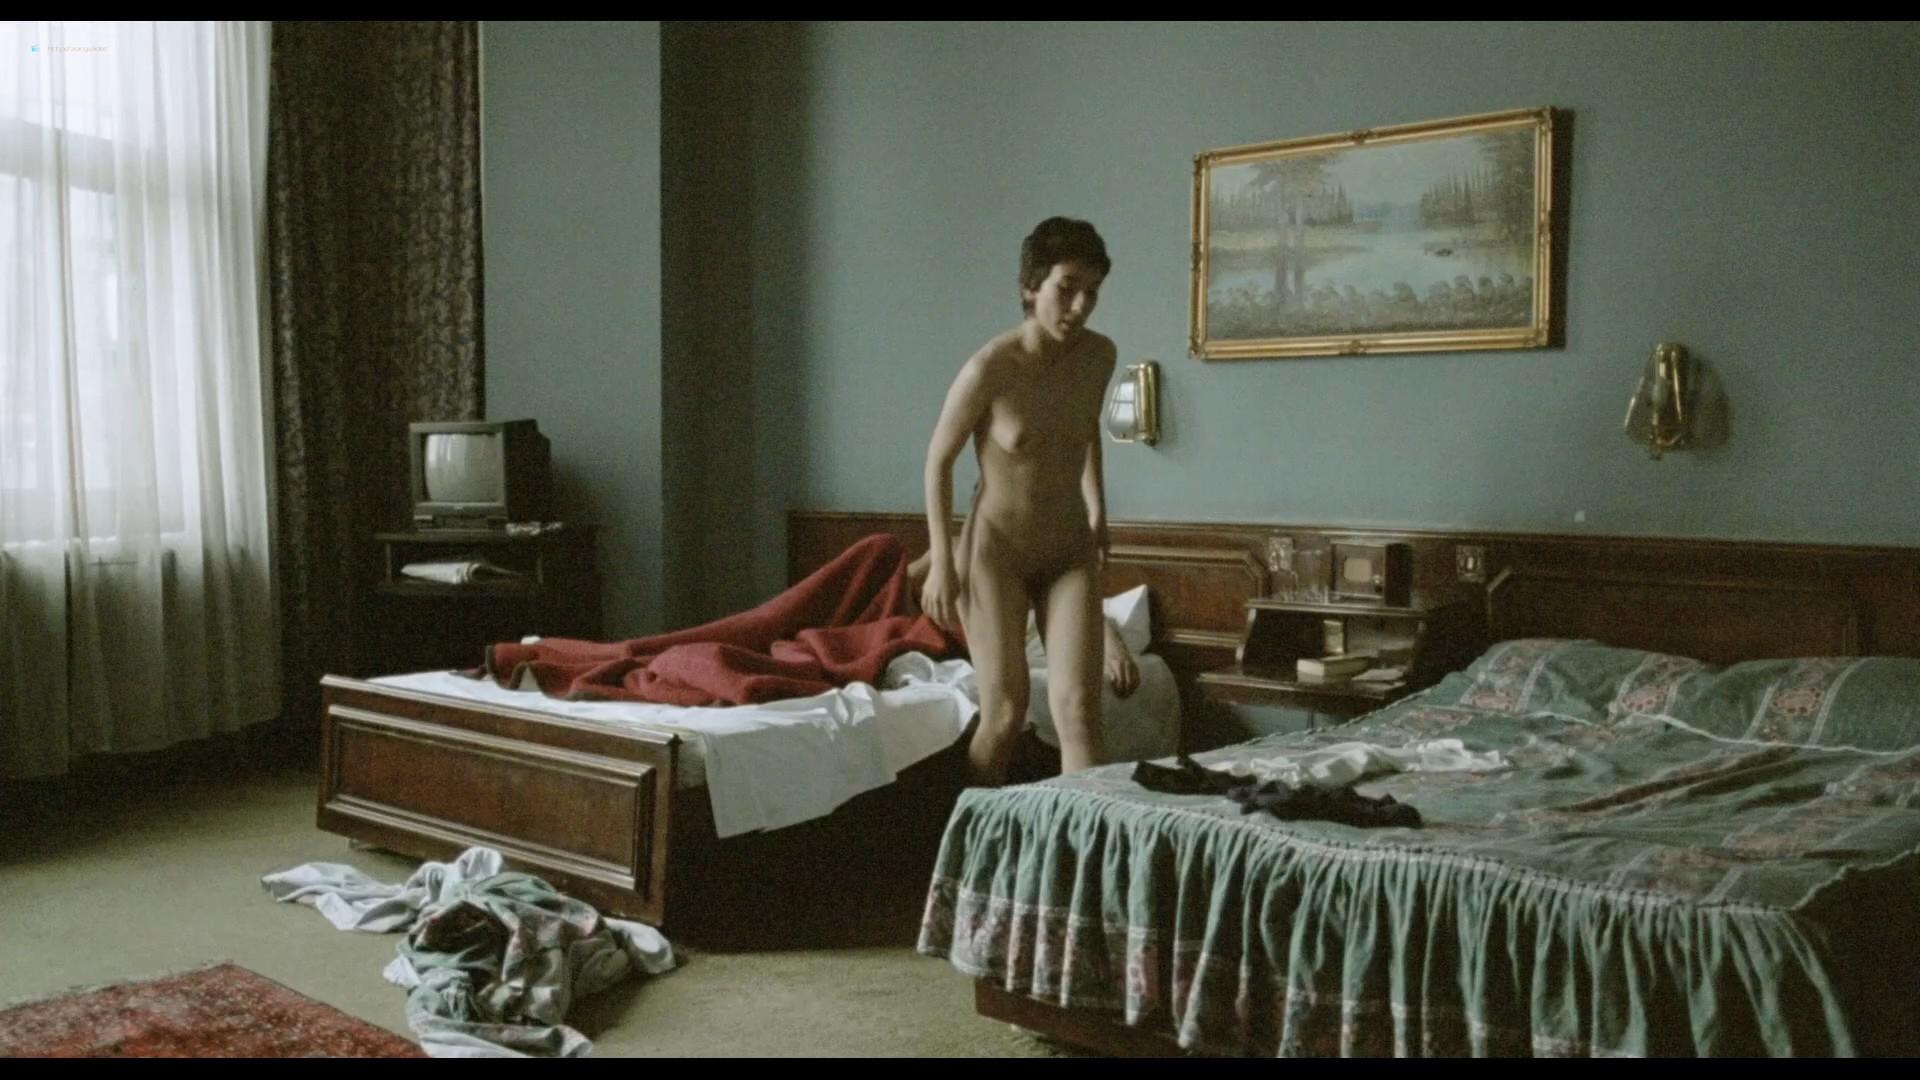 Sibel Kekilli nude full frontal and sex Catrin Striebeck nude - Head-On (2004) HD 1080p BluRay (r) (7)